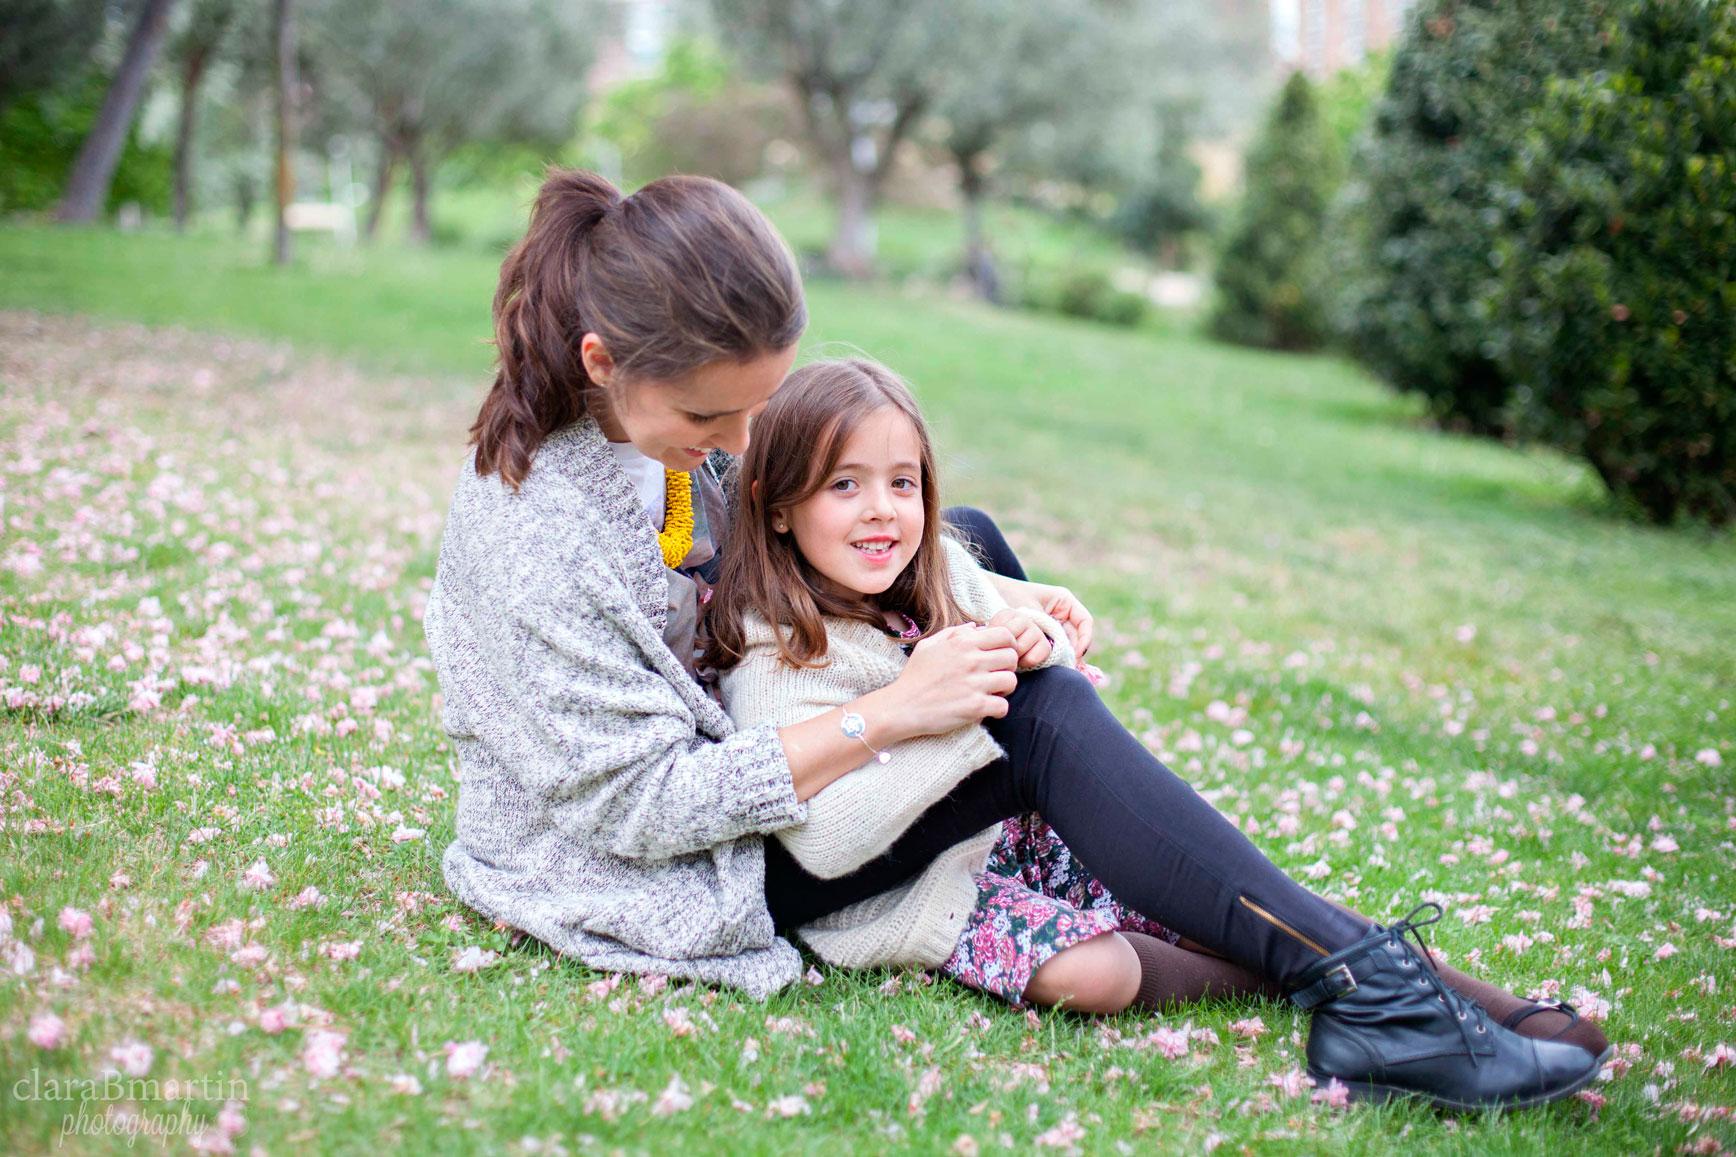 Mothers_day_claraBmartin_03